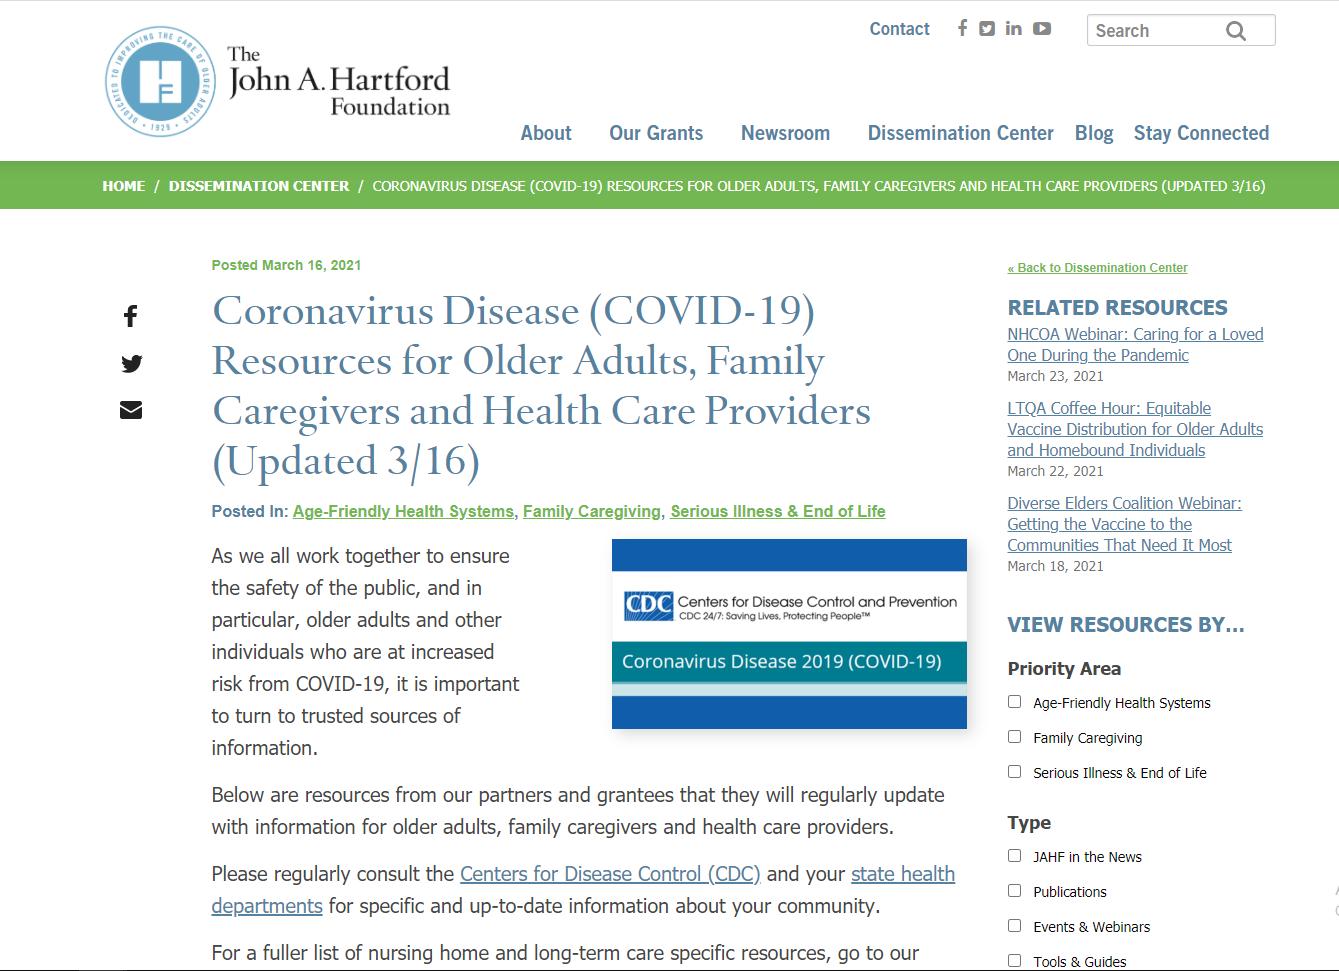 Coronavirus Disease Resources